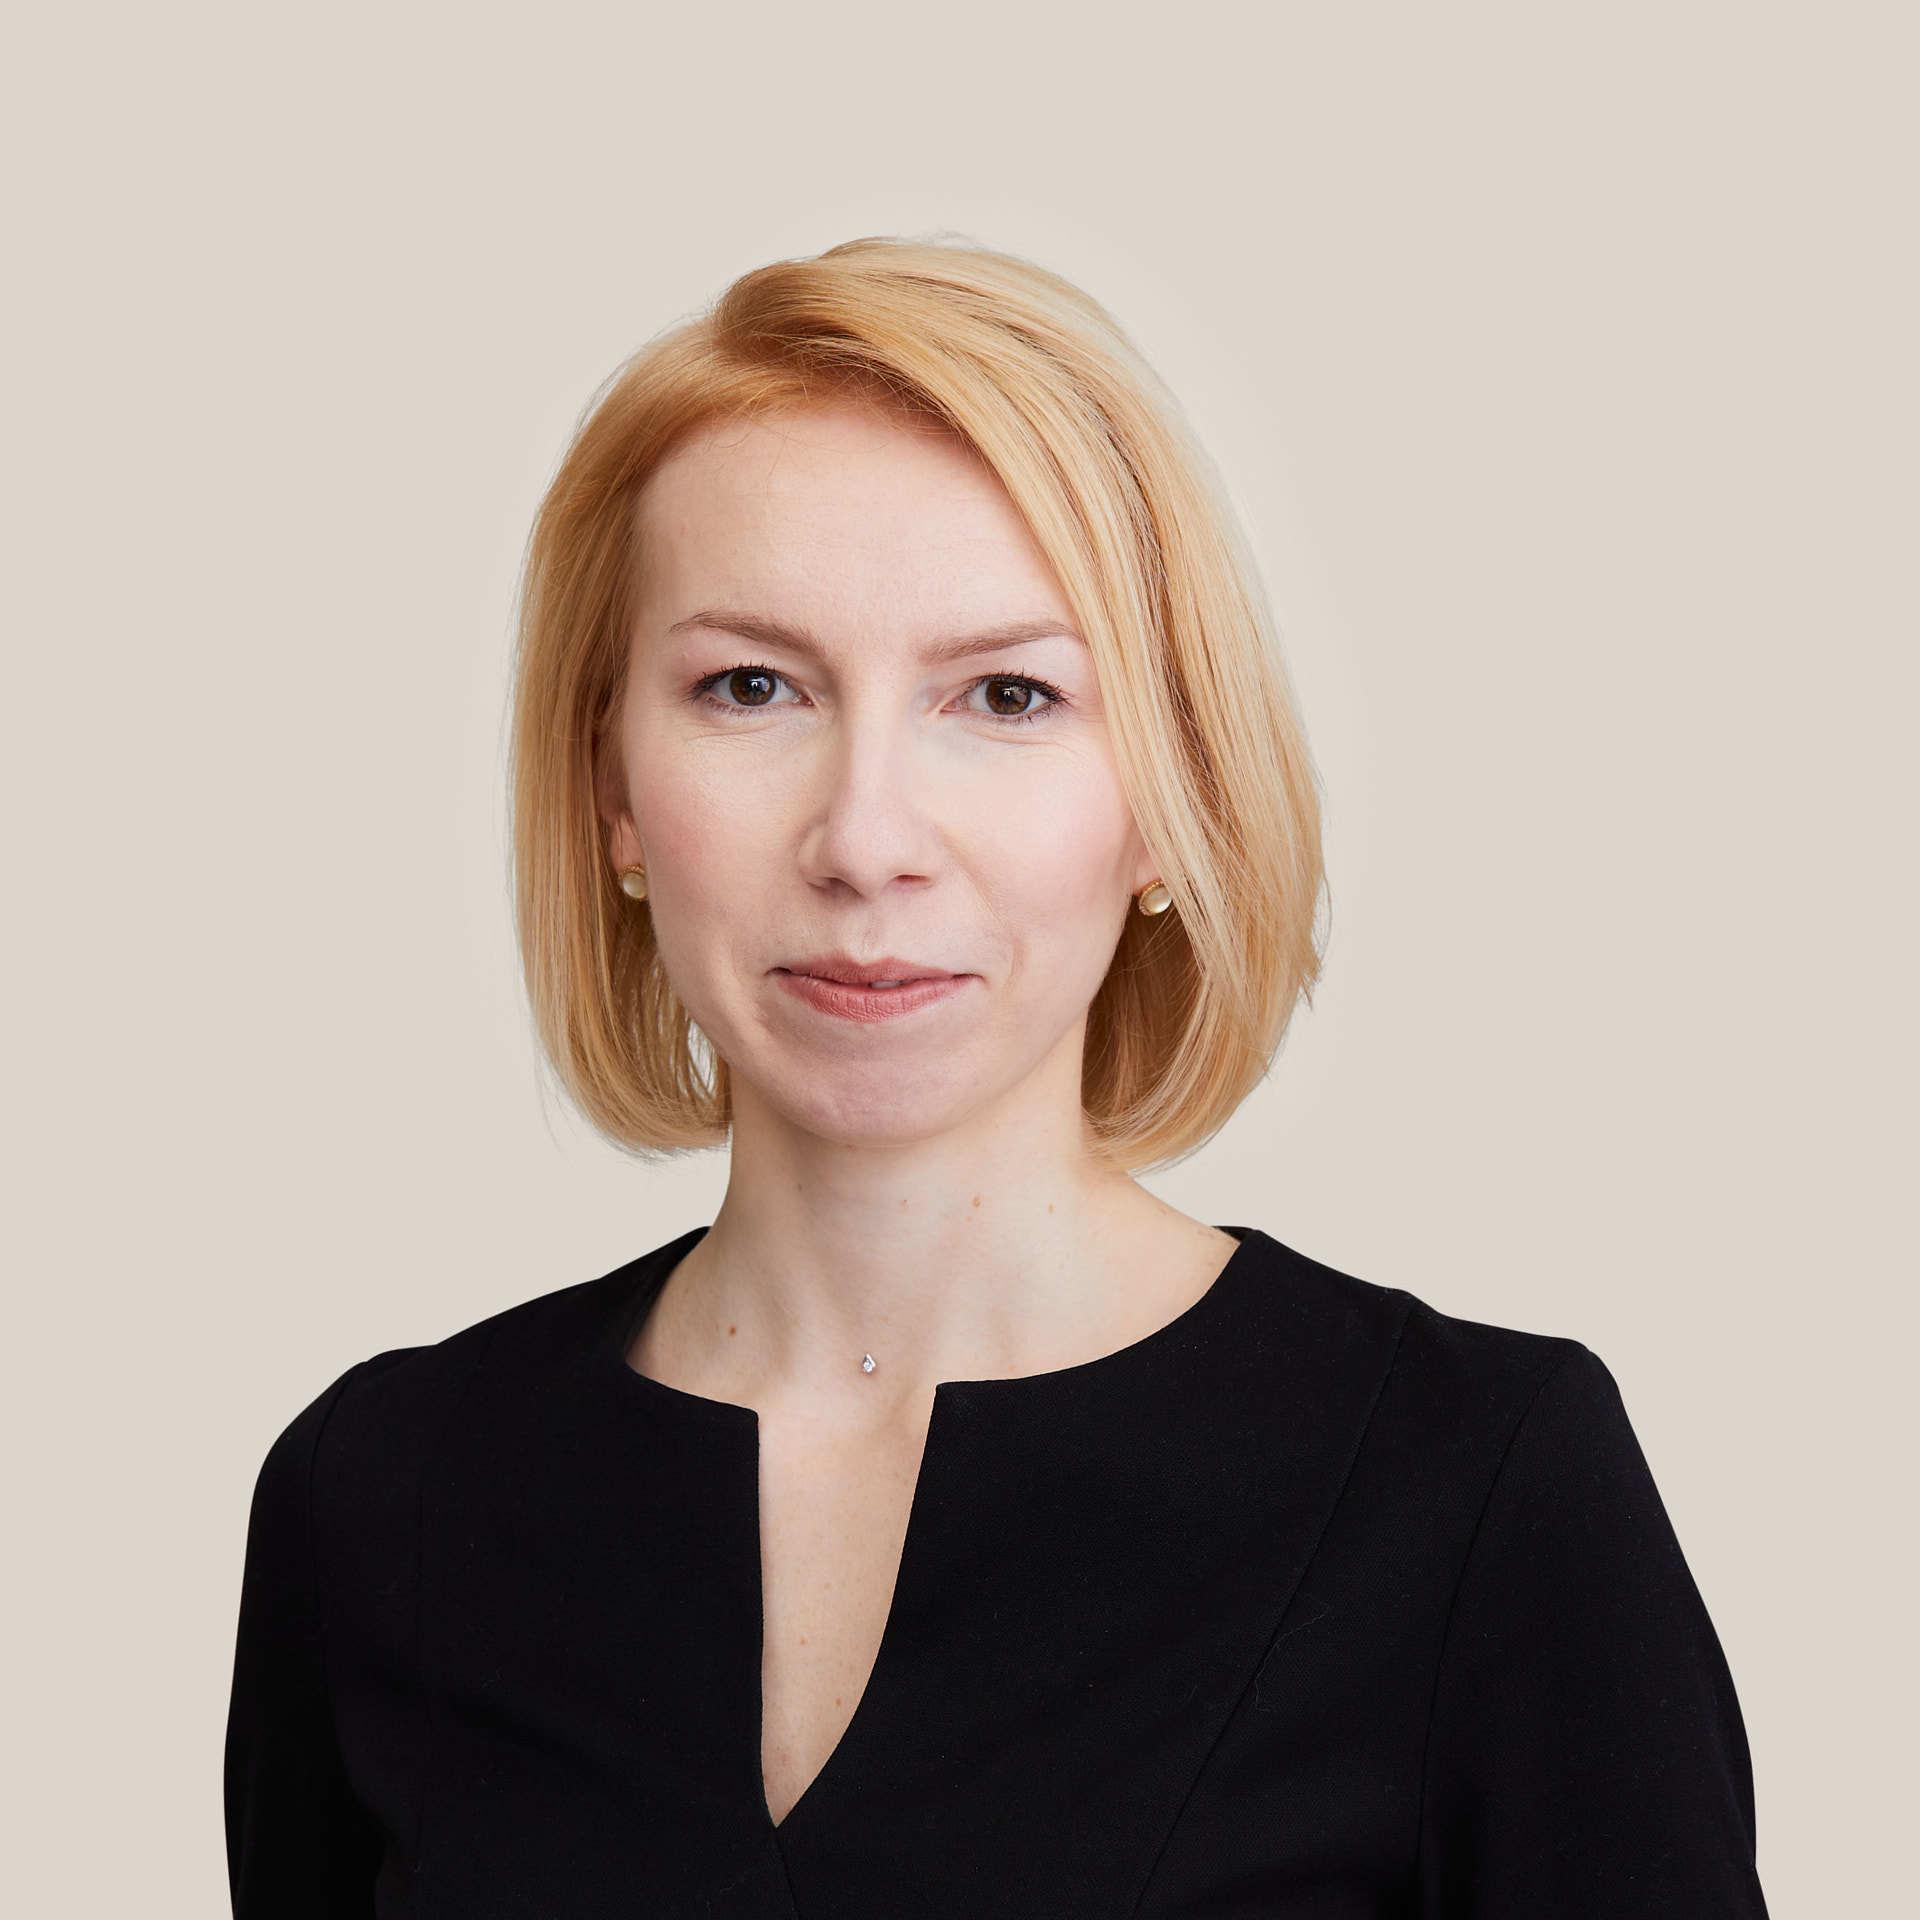 Varvara aryutina